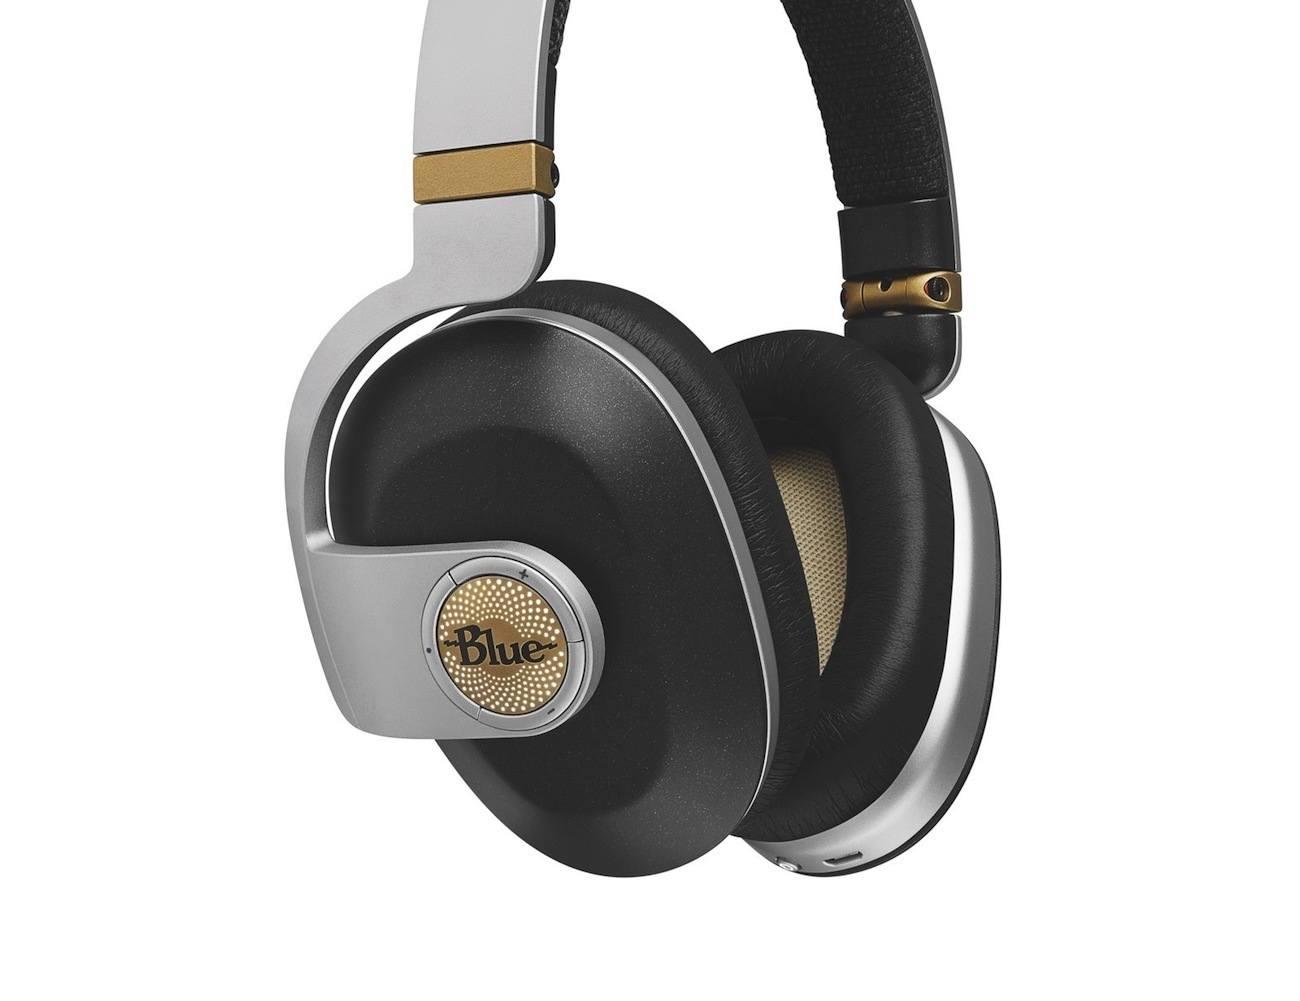 Blue Satellite Wireless Amplifier Headphones